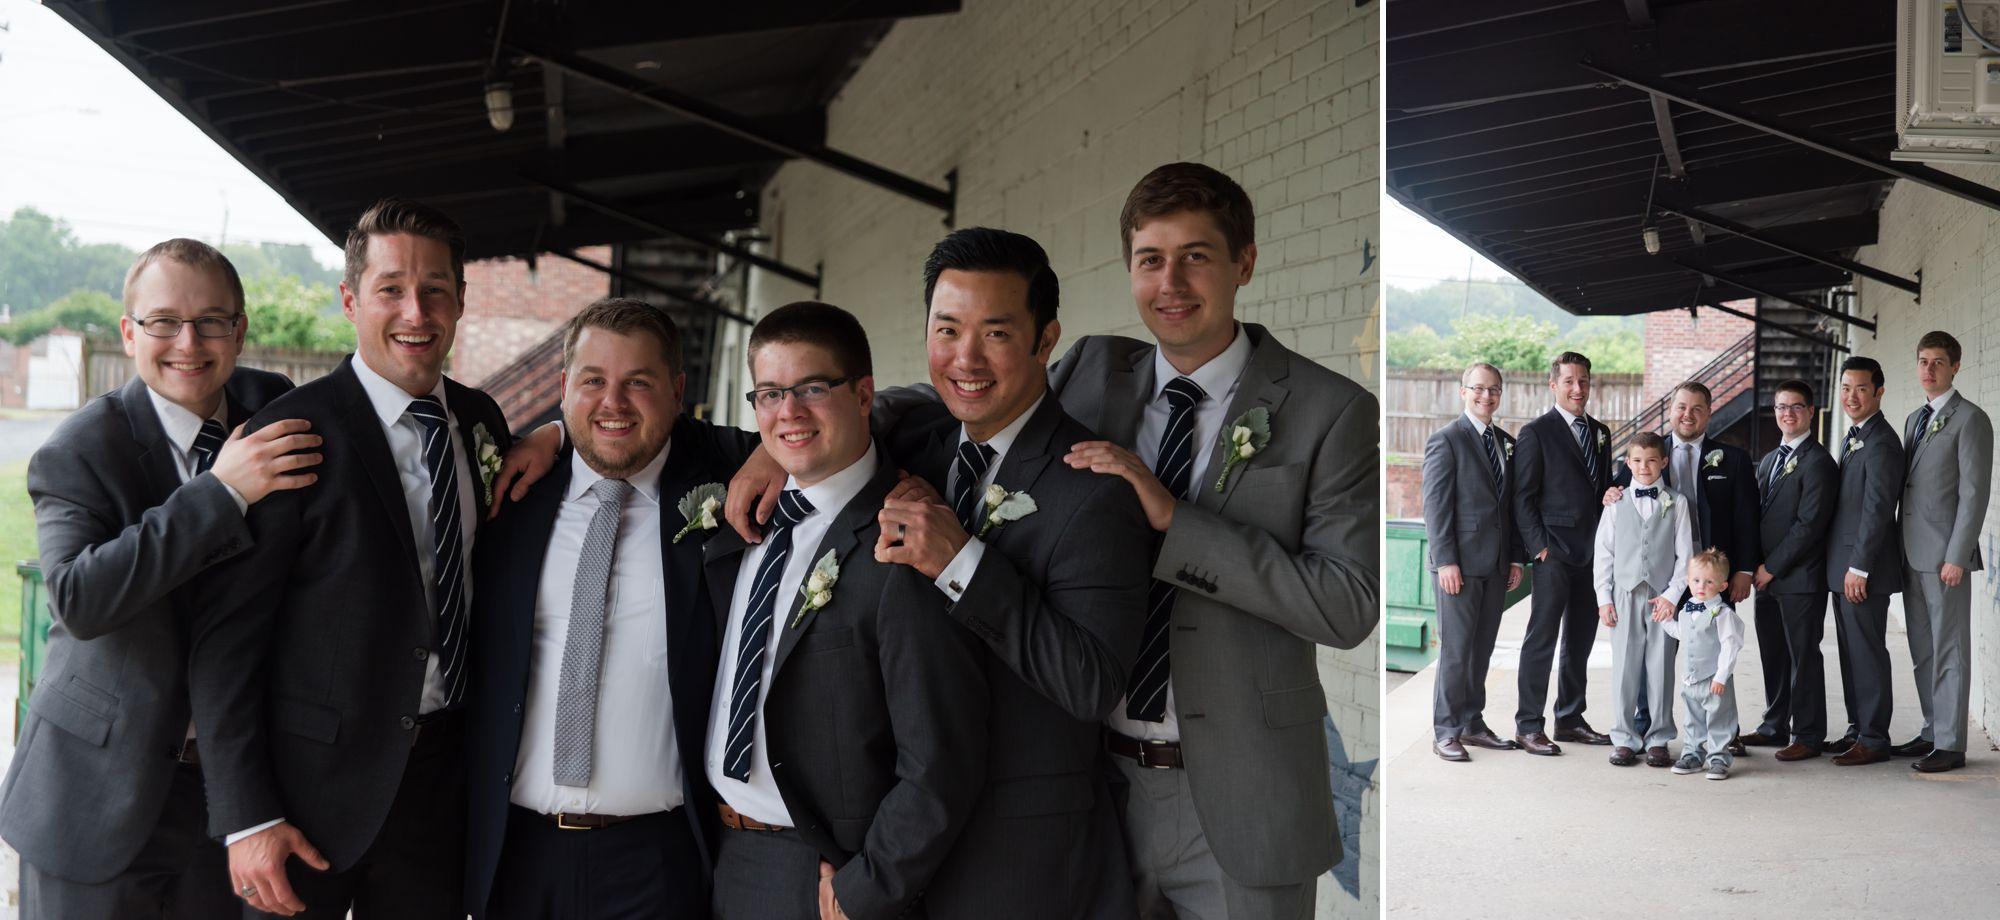 uptown-charlotte-warhouse-wedding 49